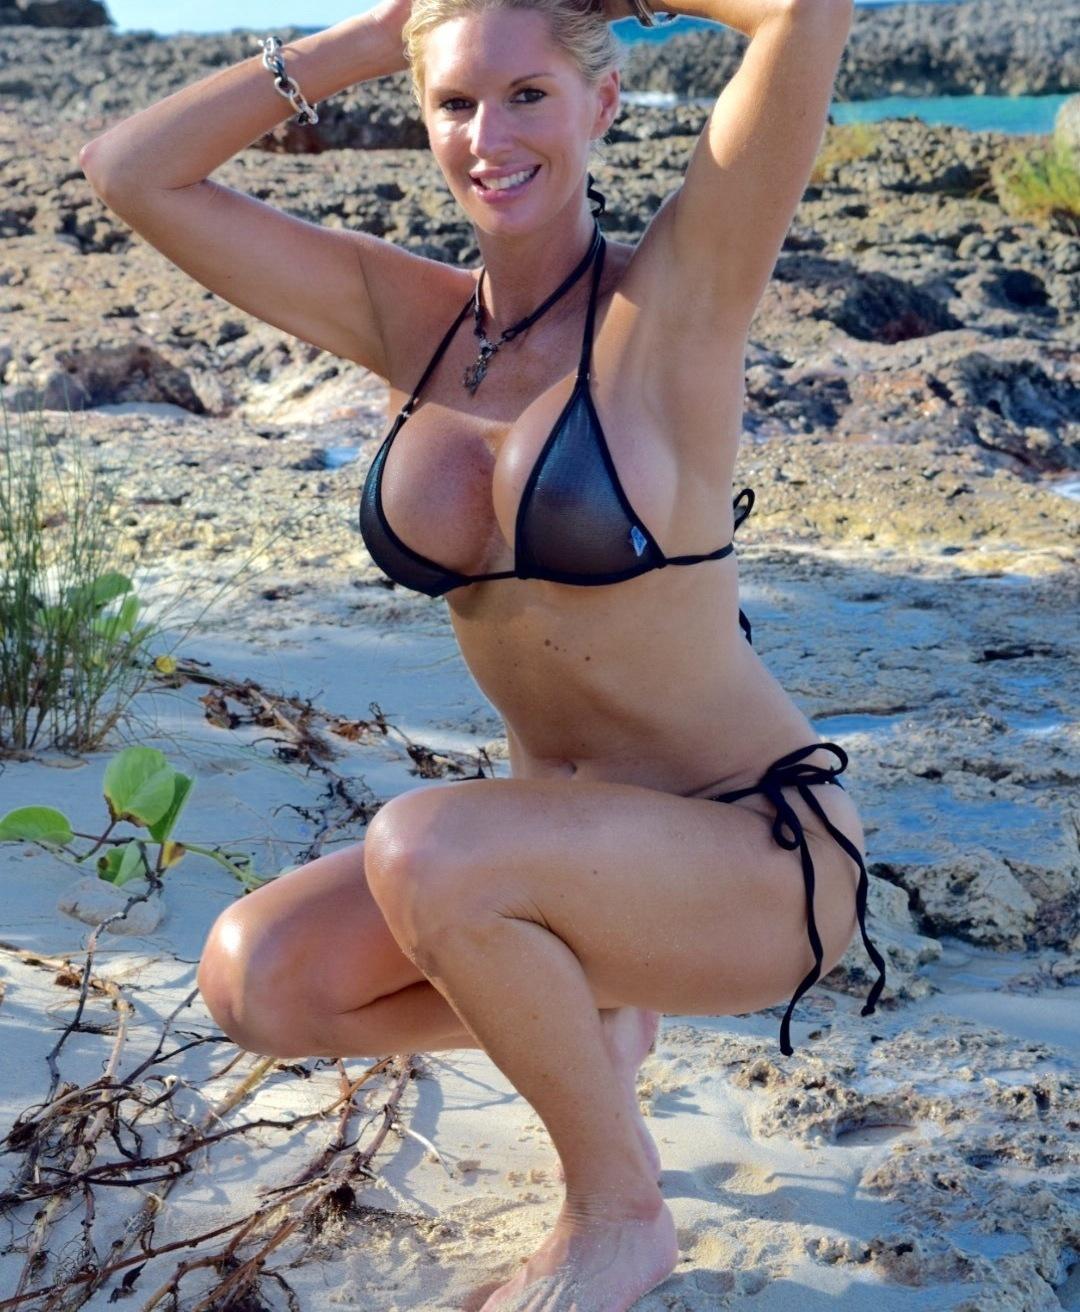 Bellasouth Lavidahermosa Onlyfans Nudes Leaks 0018